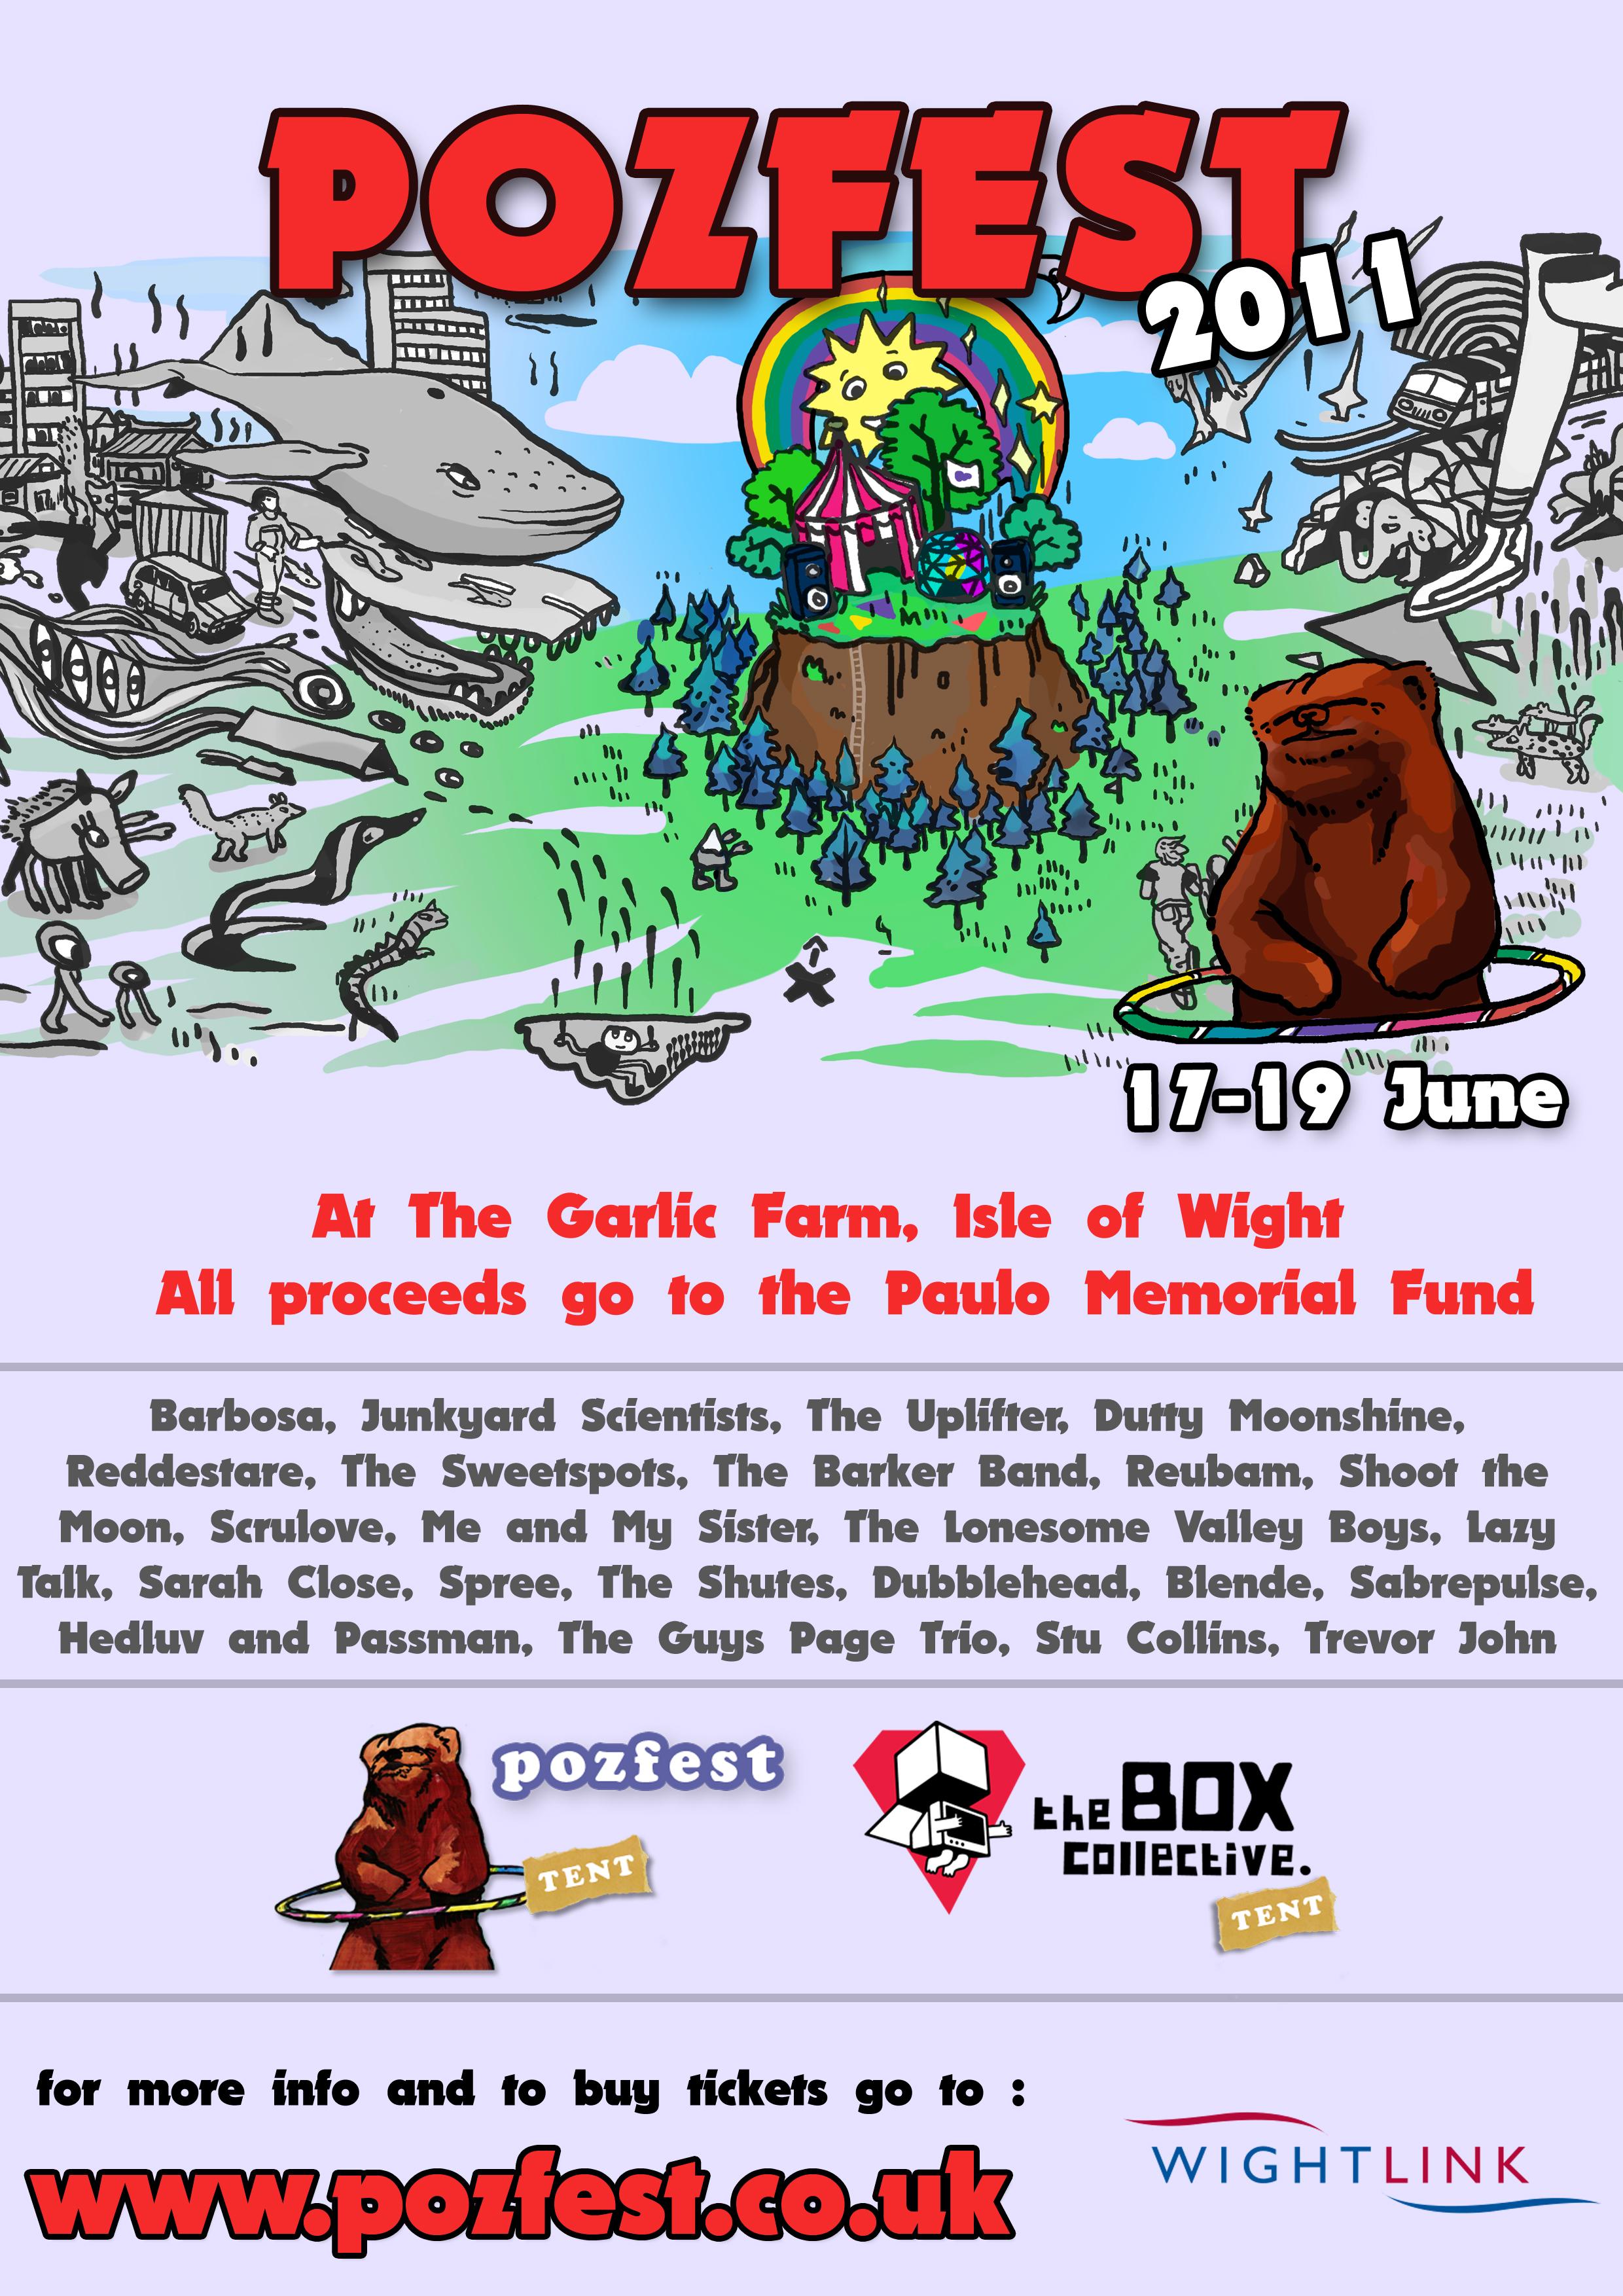 Pozfest poster Wightlink.jpg